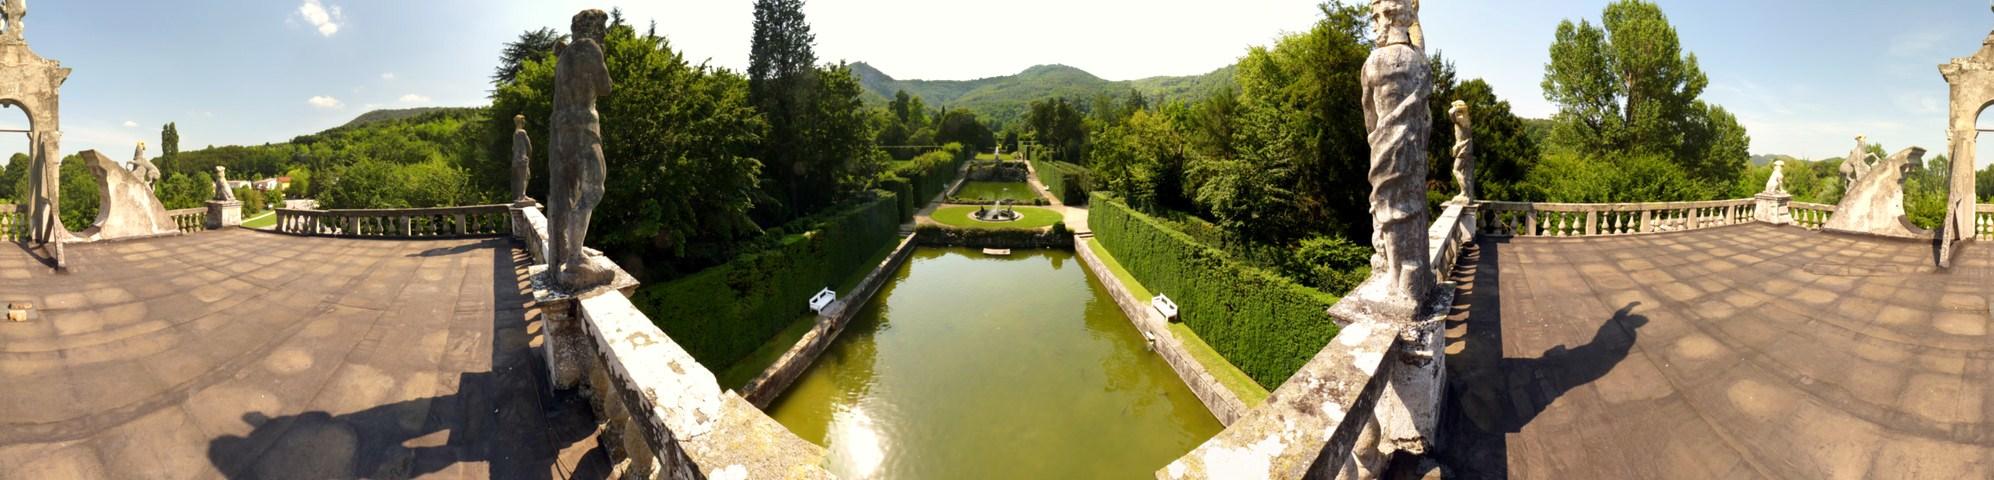 Villa Barbarigo La Piccola Versailles Dei Colli Euganei